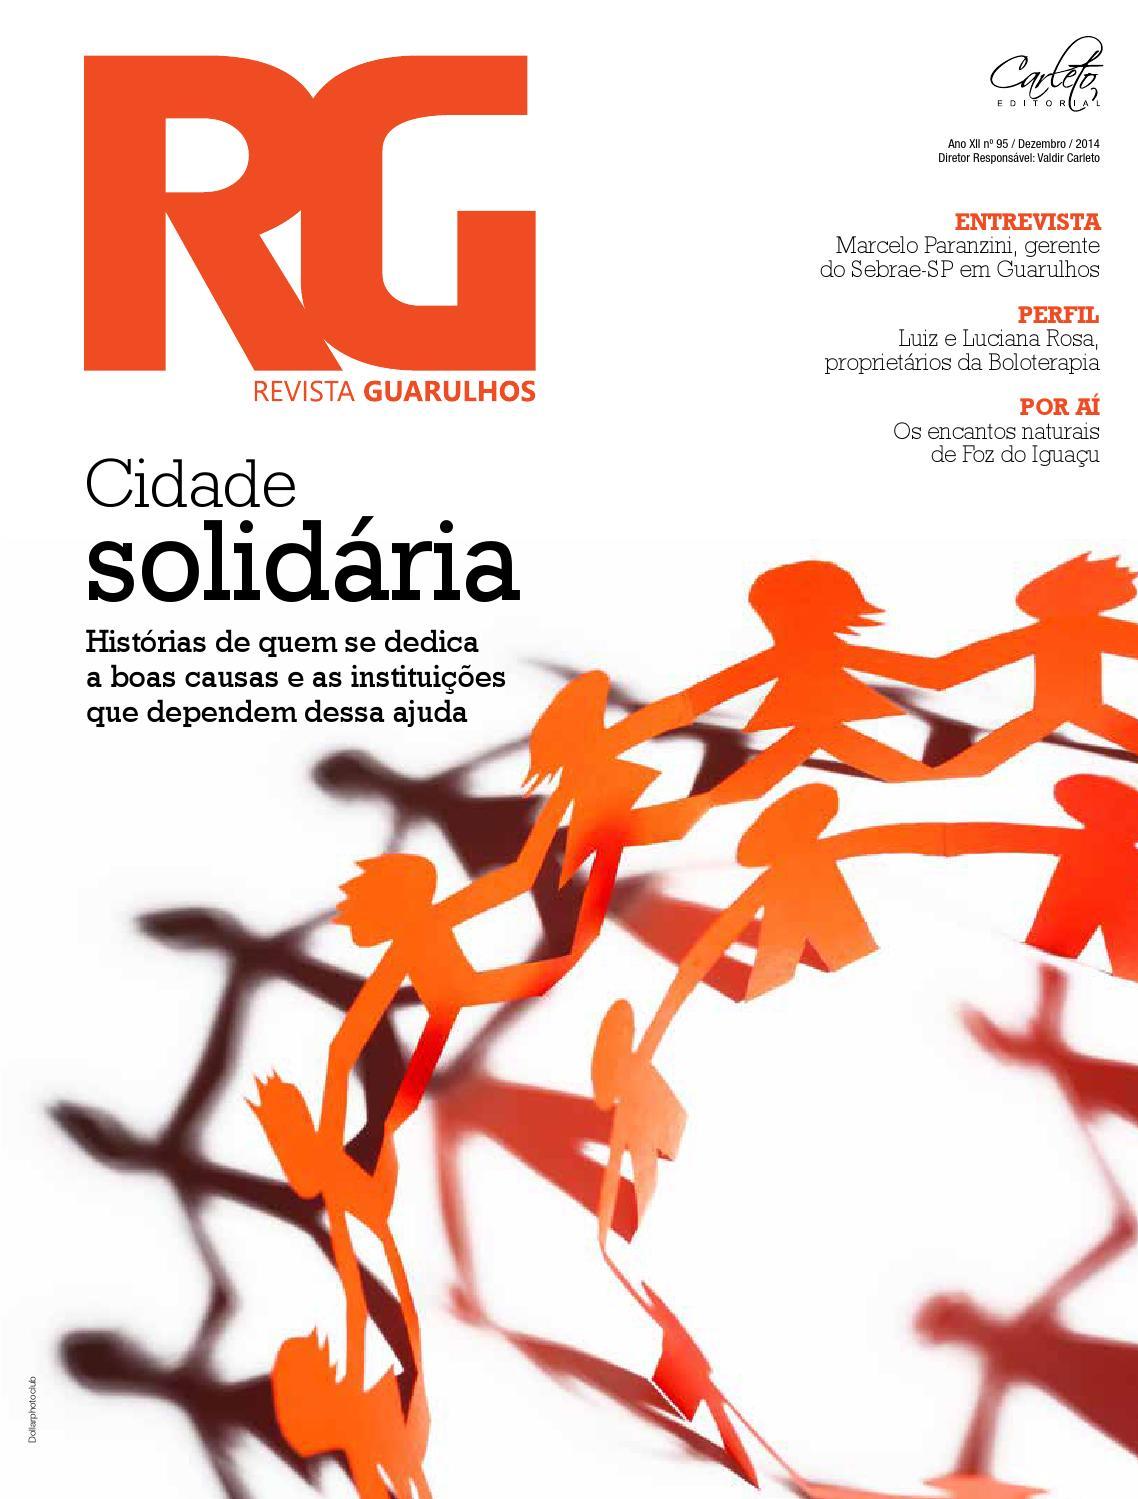 Revista Guarulhos Edicao 95 By Carleto Editorial Issuu